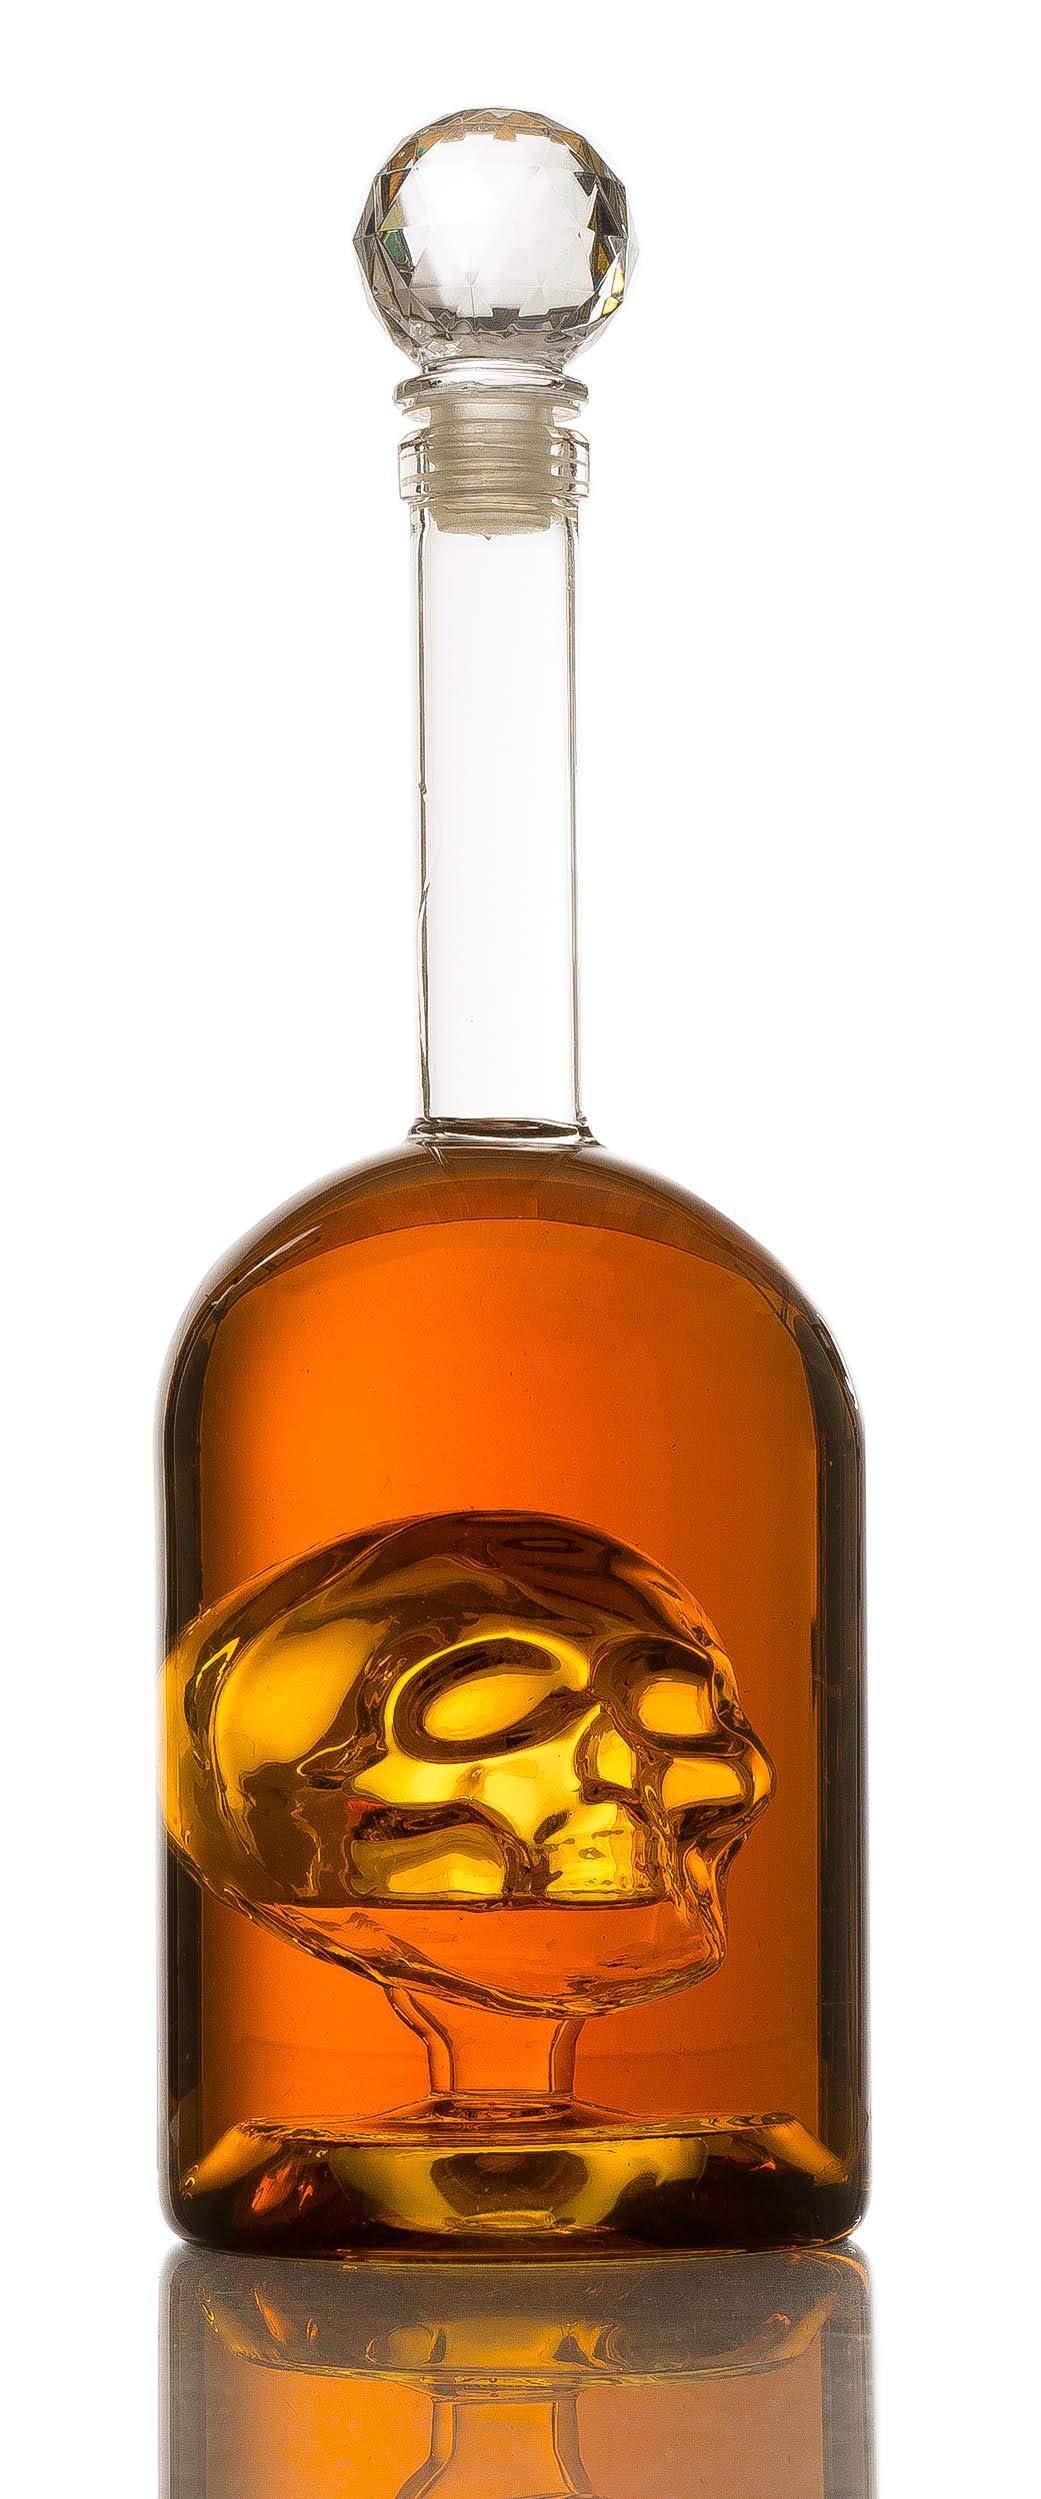 Skull Decanter in Bottler Skull Head by The Wine Savant, Skull Bottle Skull face Enlarges with Whiskey, Tequila, Bourbon Scotch or Rum - Great Gift For Any Bar!